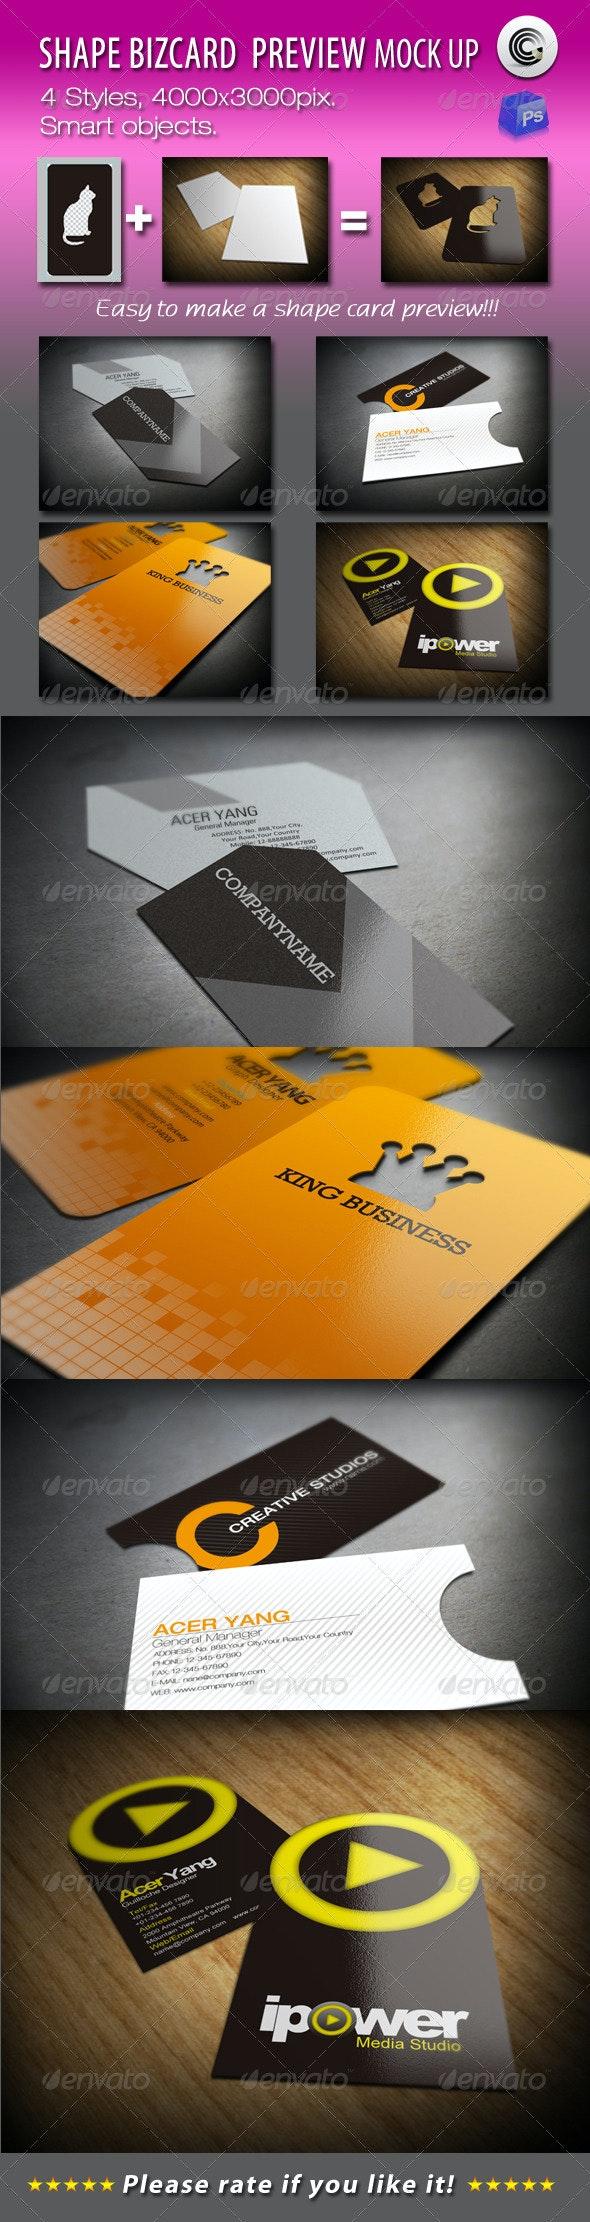 Shape BizCard Preview Mock-ups - Business Cards Print